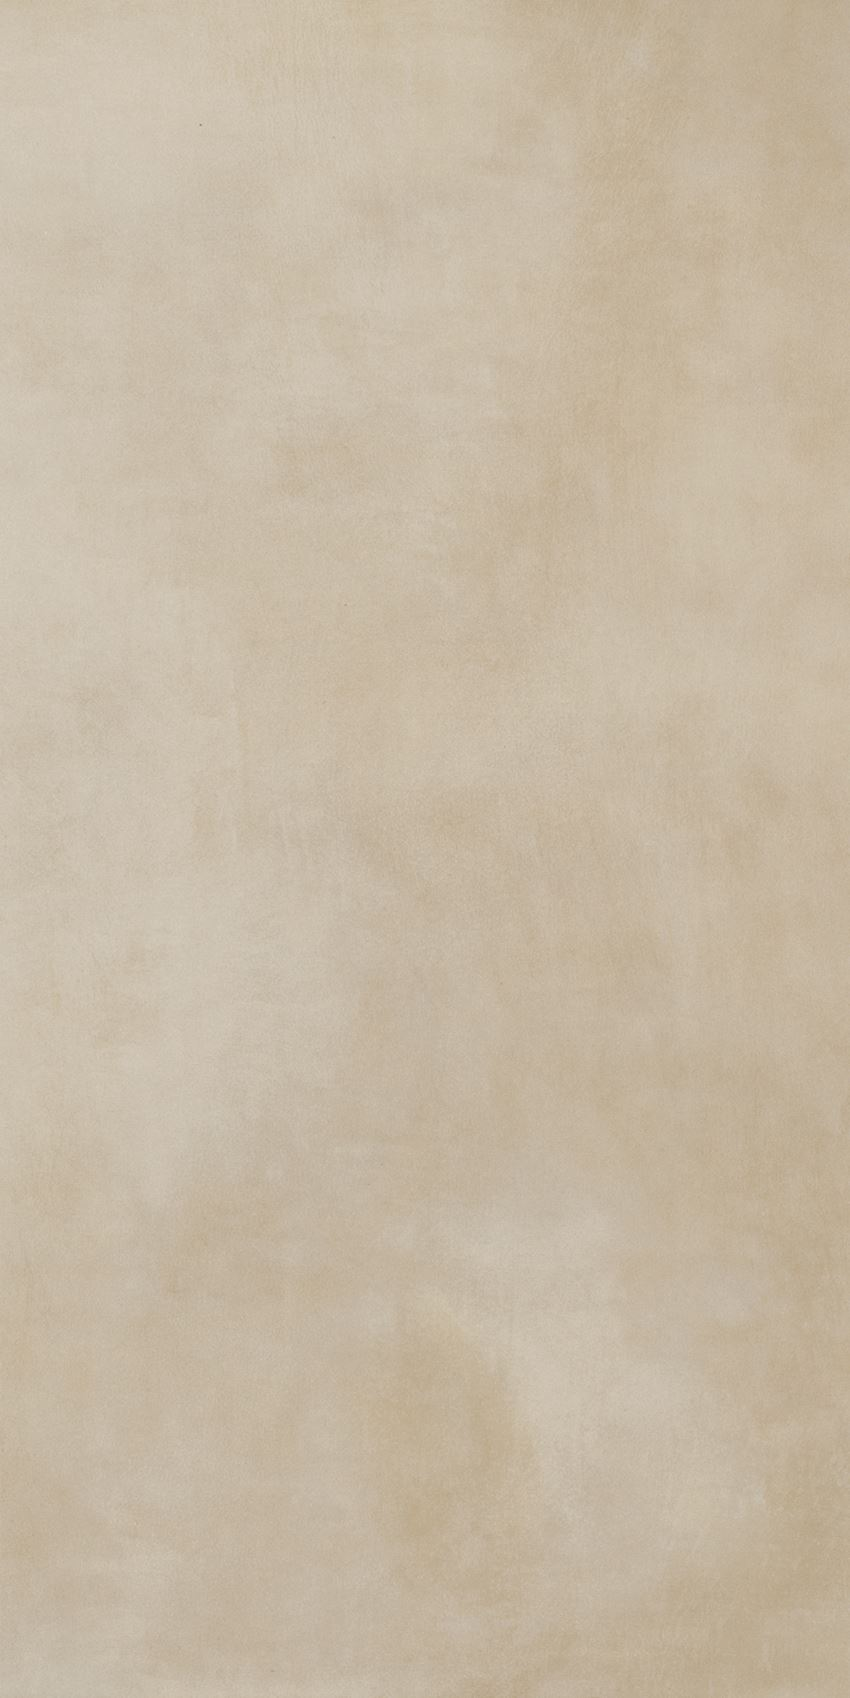 Płytka uniwersalna 29,8x59,8 cm Paradyż Tecniq Beige Gres Szkl. Rekt. Mat.